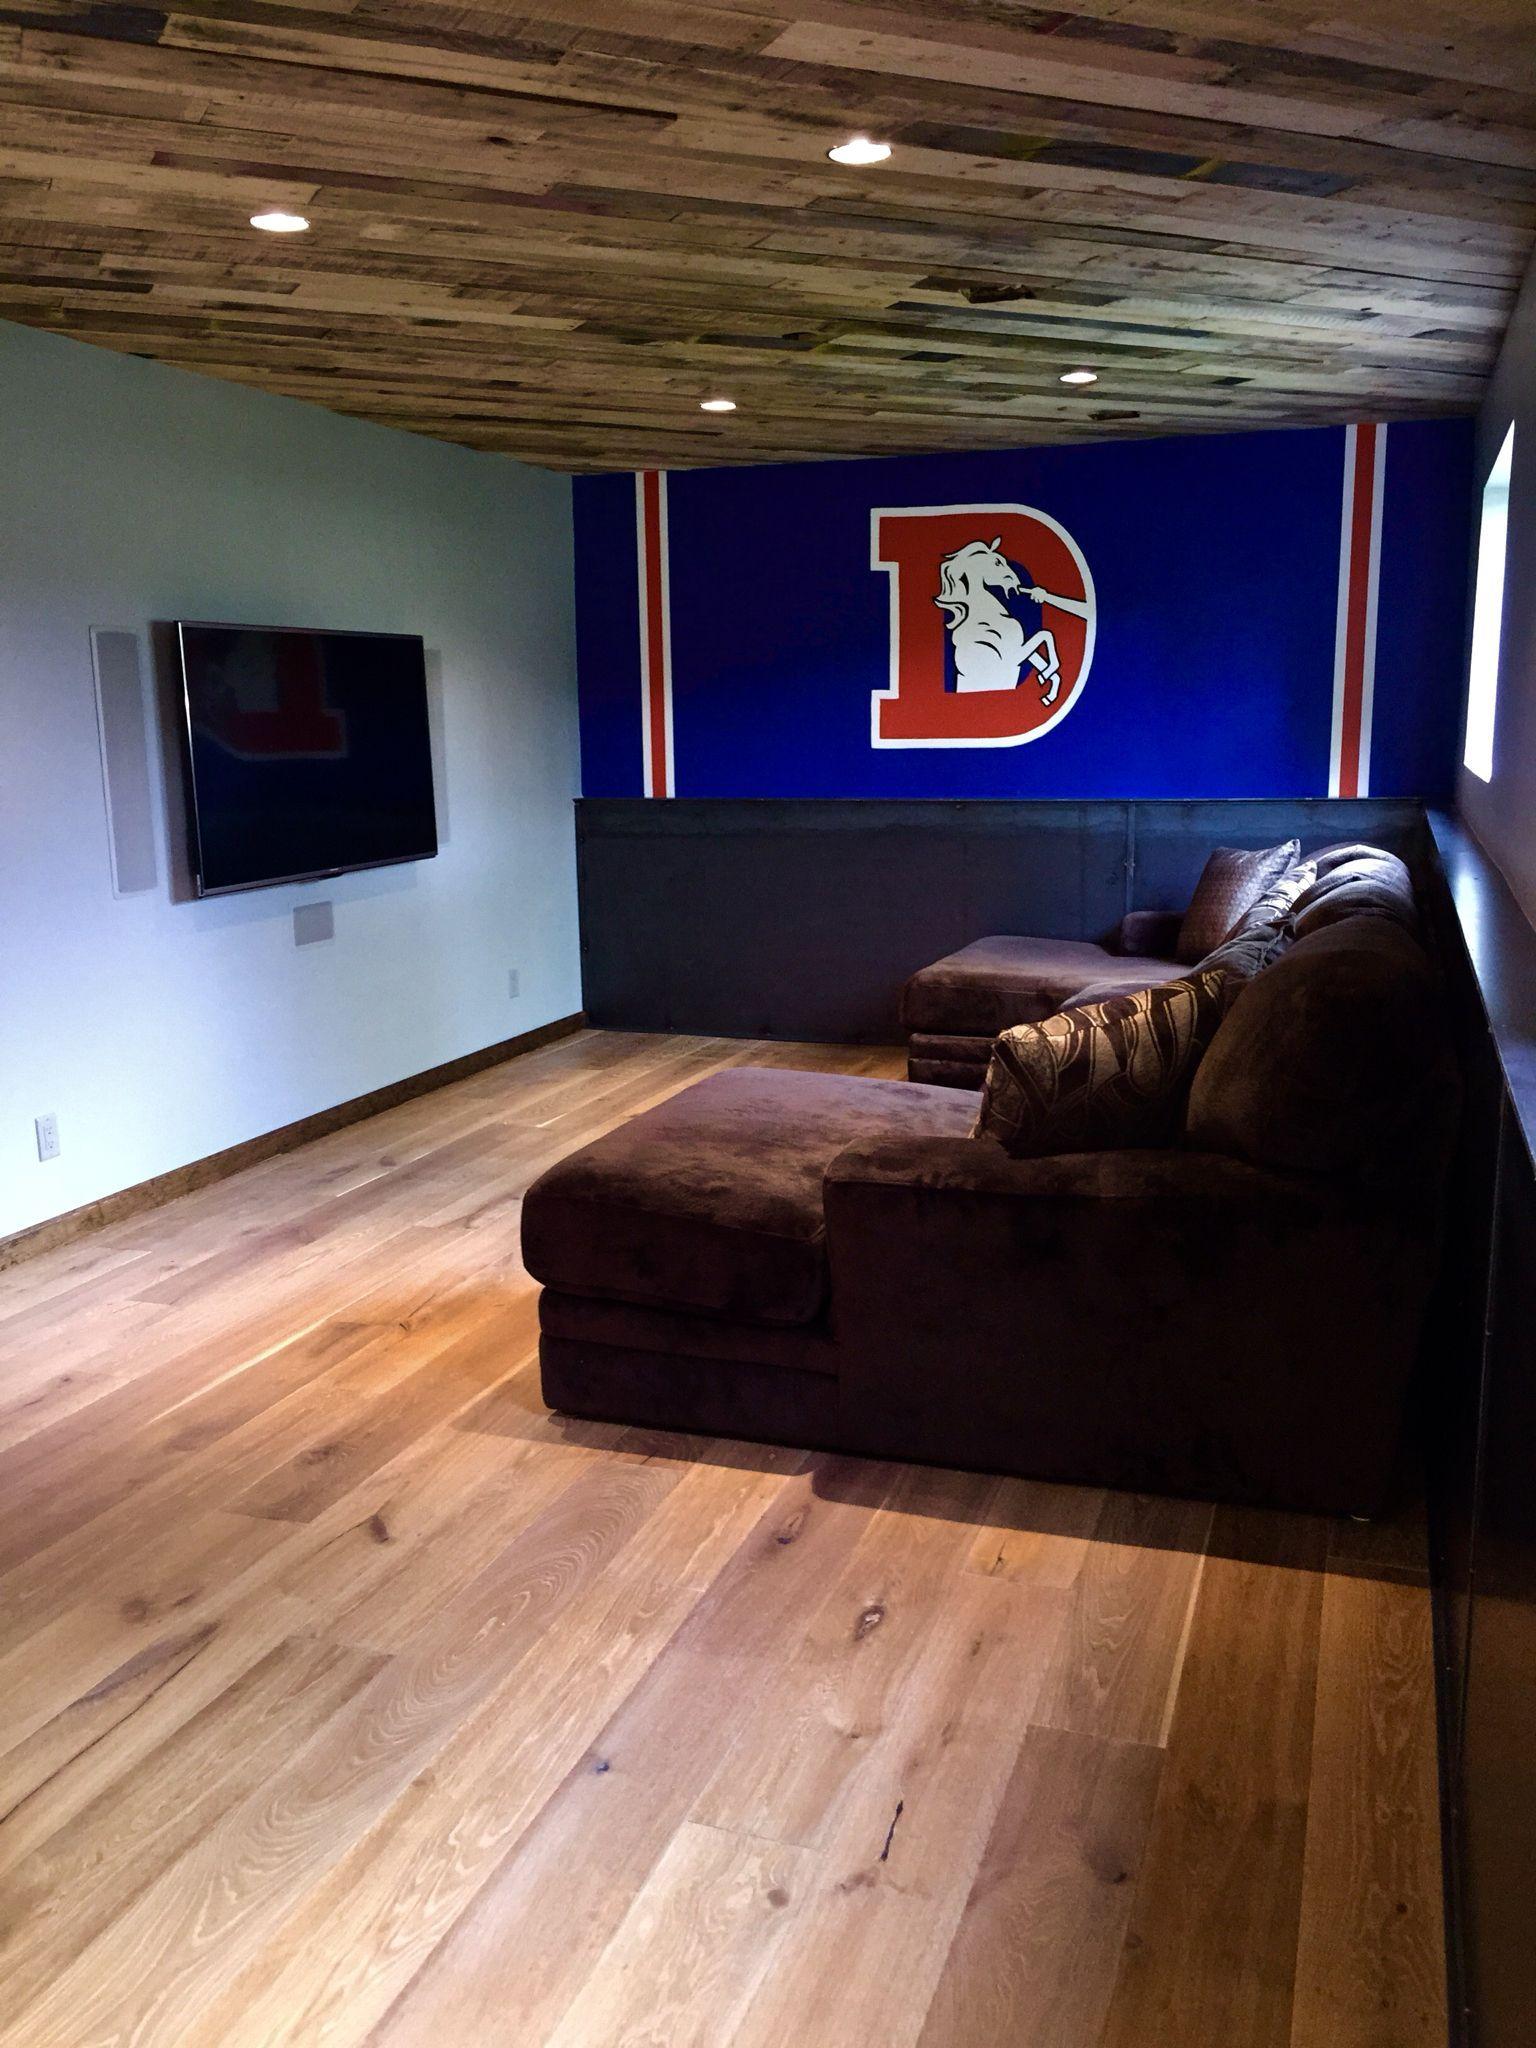 Pin By Trea Men On Man Cave In 2020 Denver Broncos Room Man